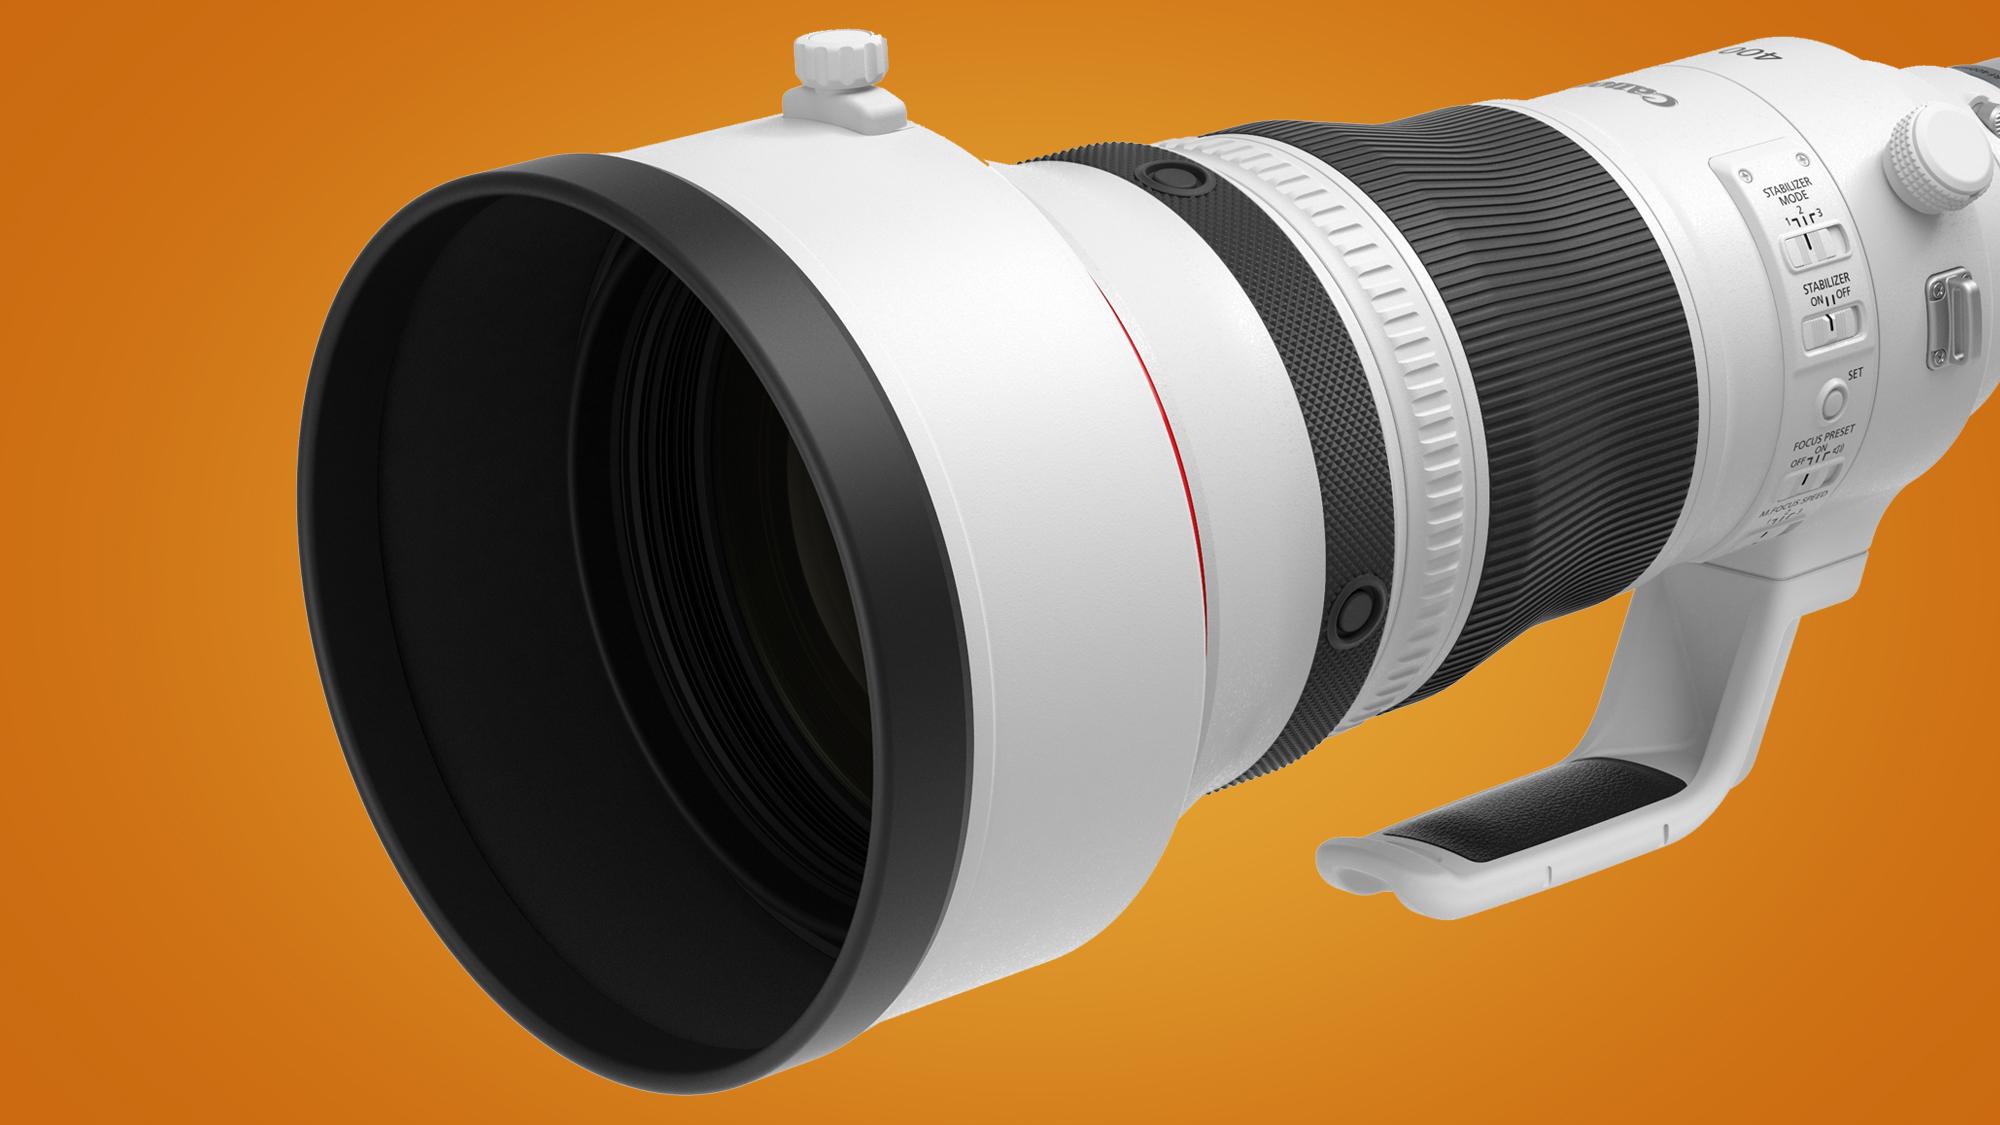 Canon RF 400mm f/2.8